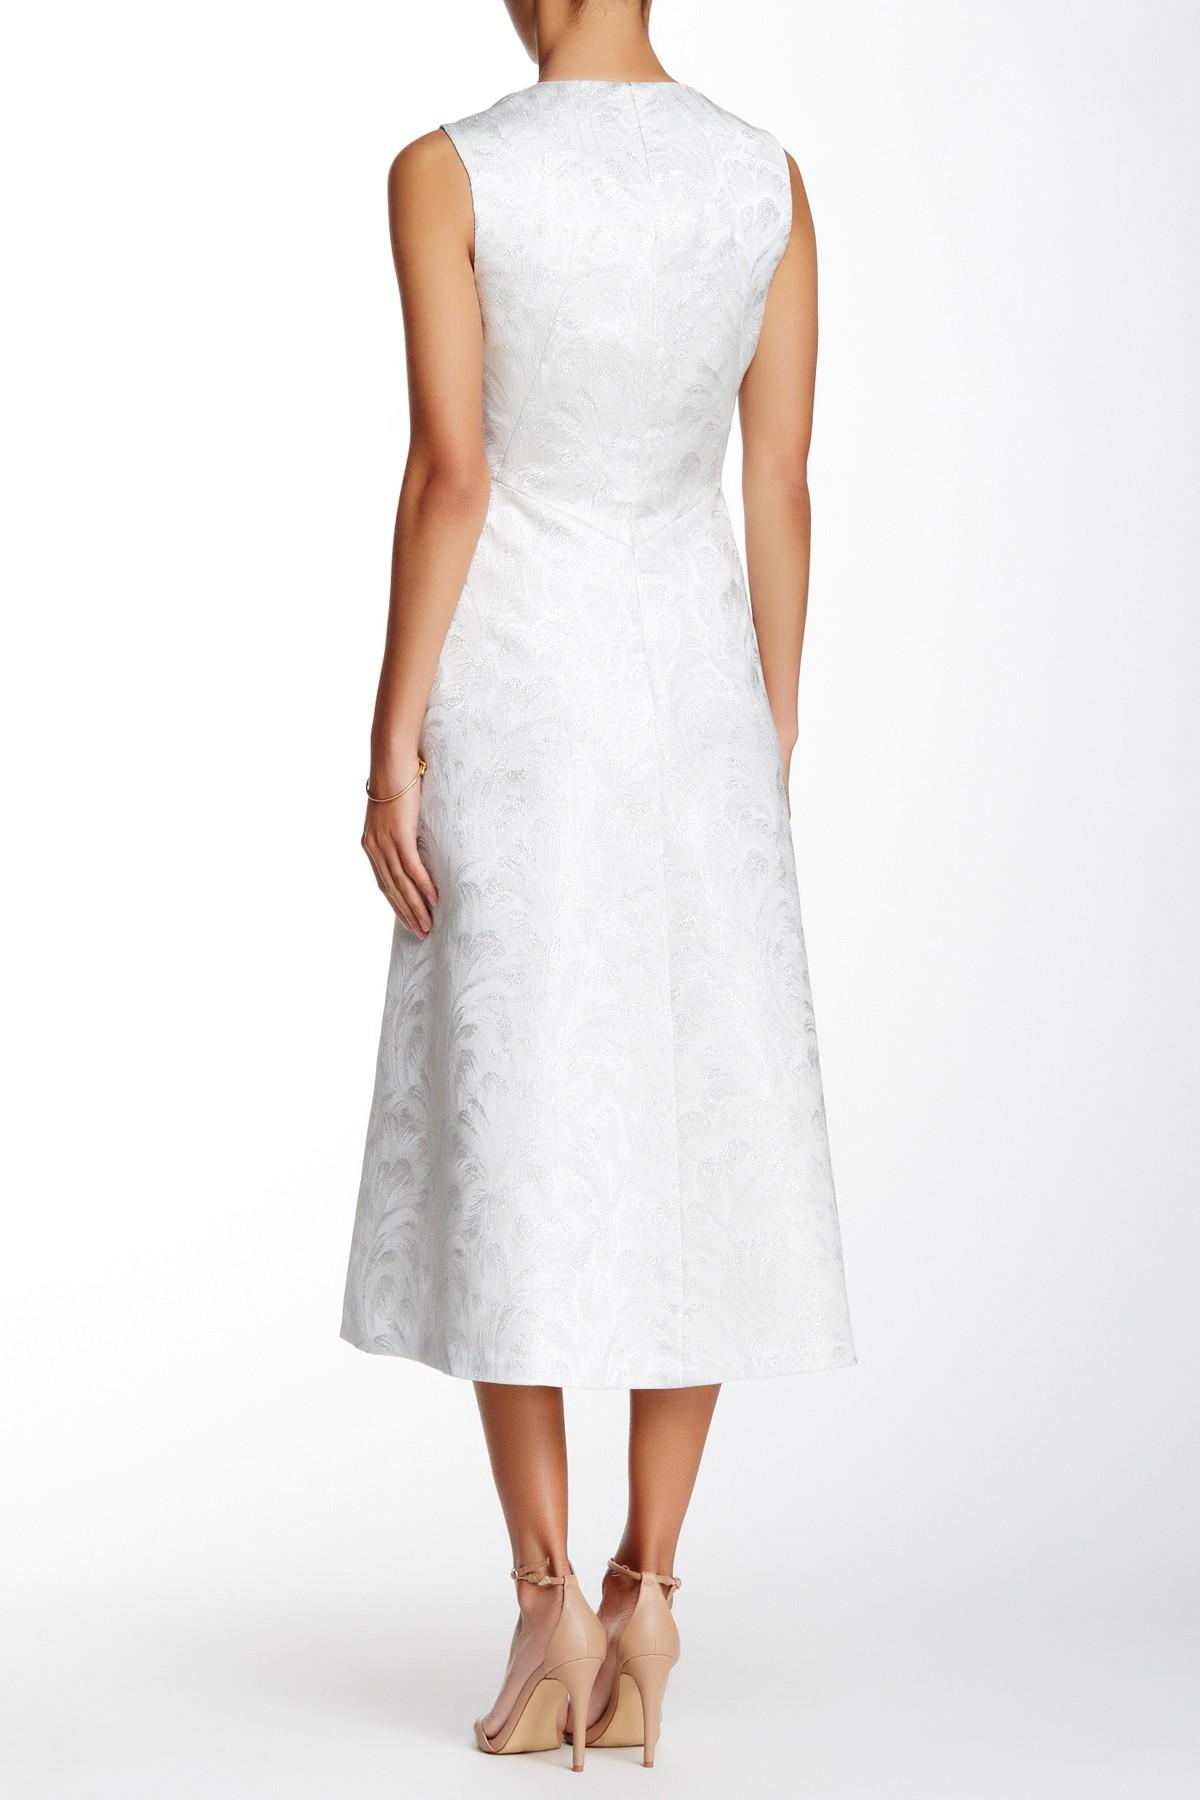 Anne Klein Metallic Jacquard Seamed Fit Amp Flare Dress In